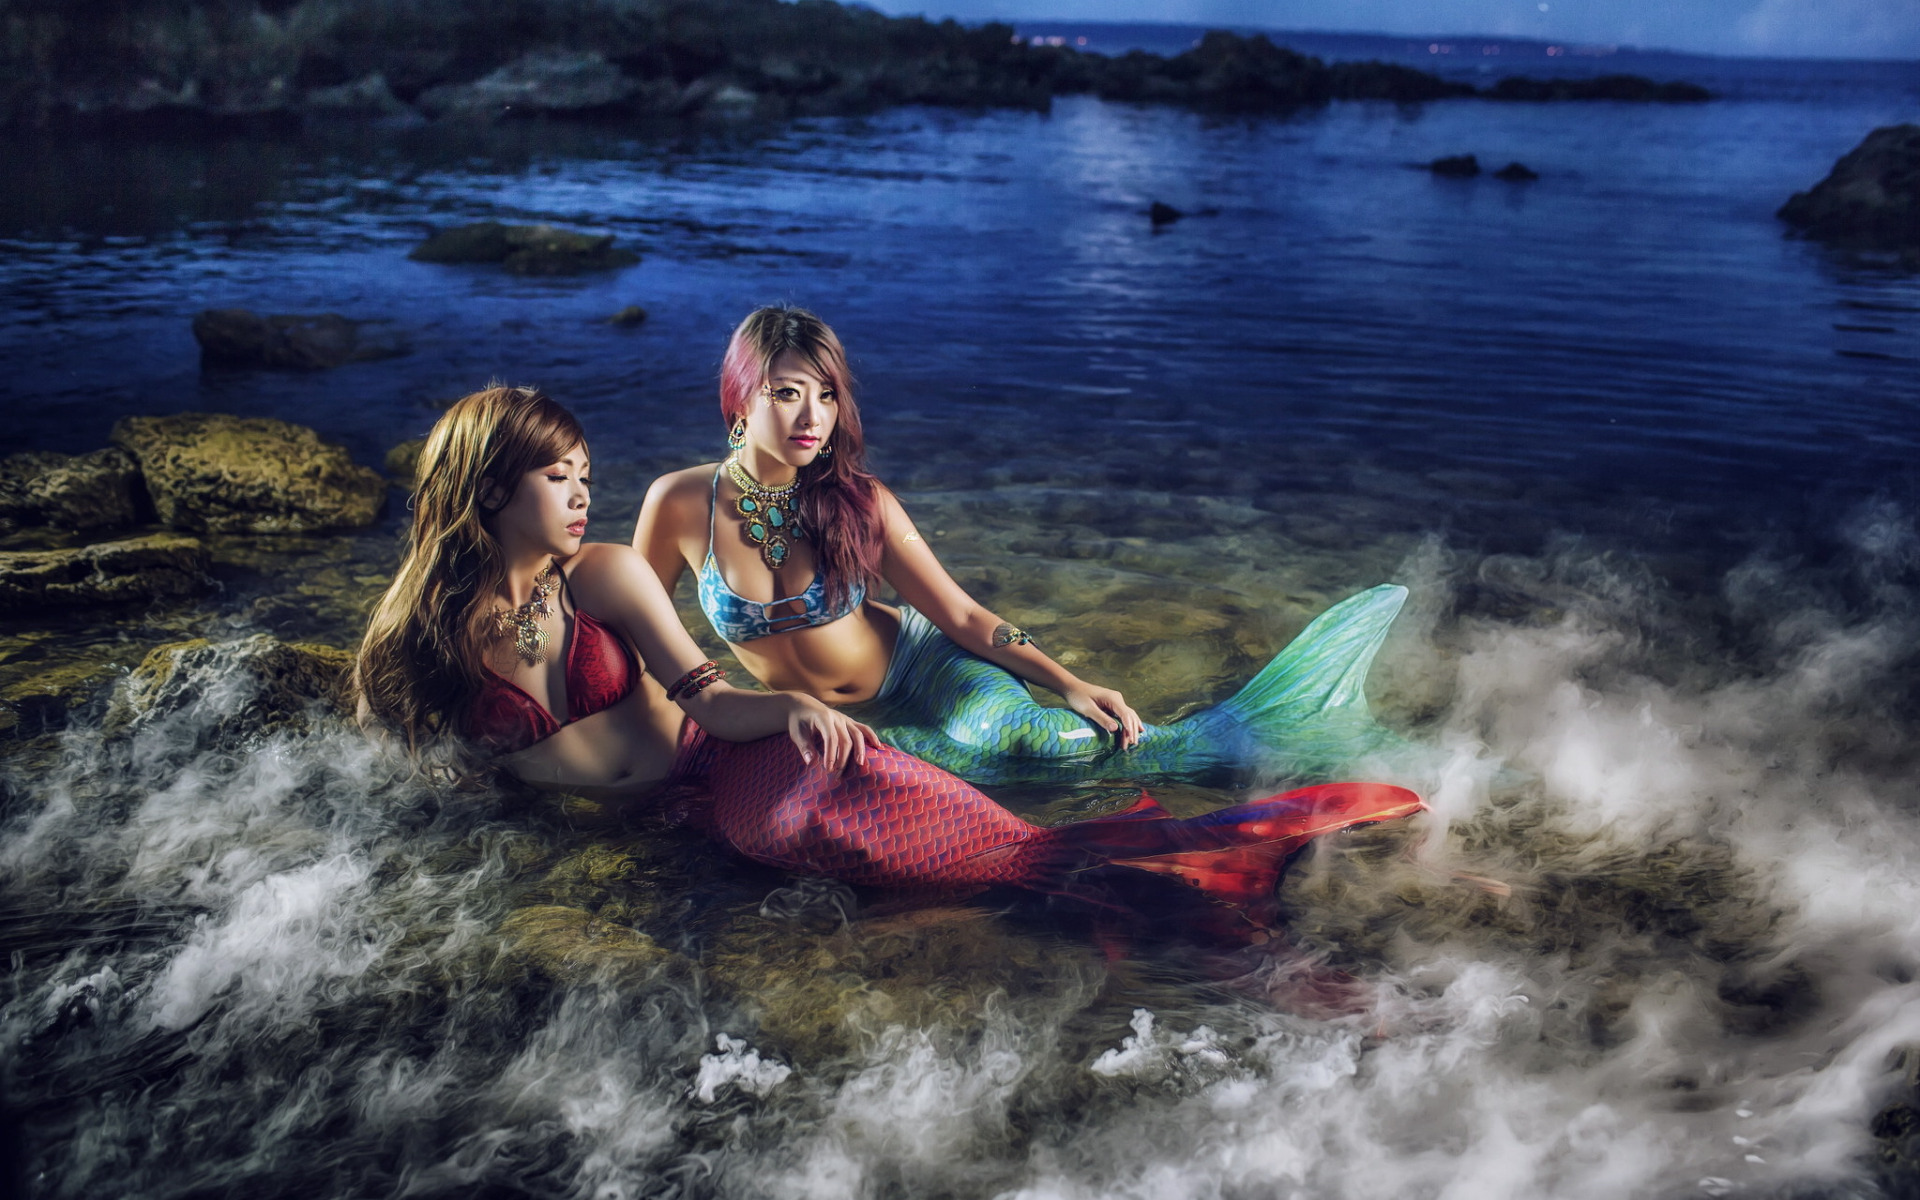 Картинки про русалок для девочек